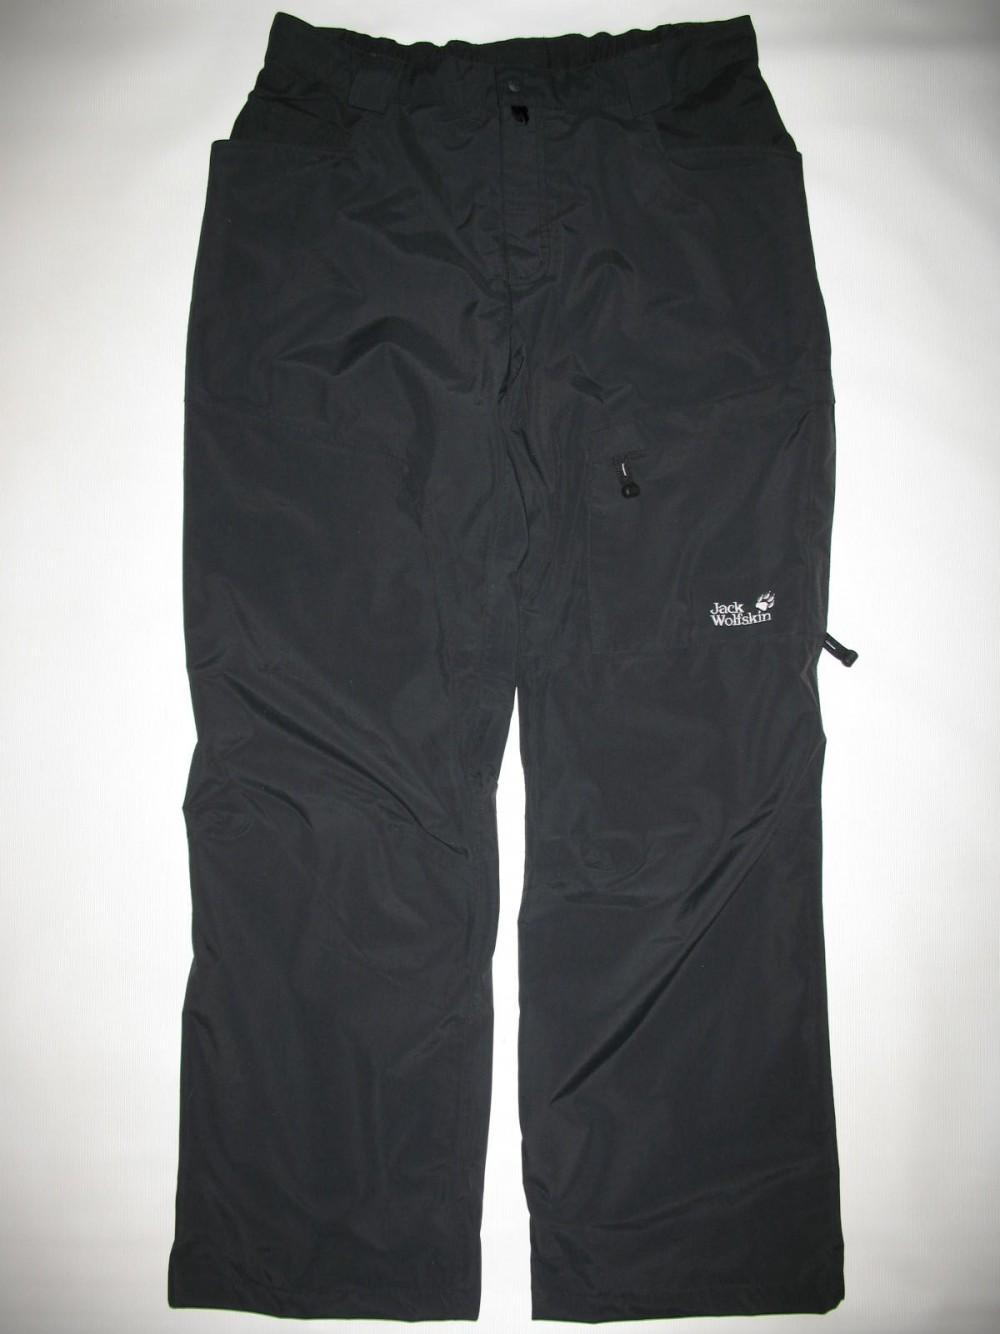 Штаны JACK WOLFSKIN texapore pants (размер M) - 1